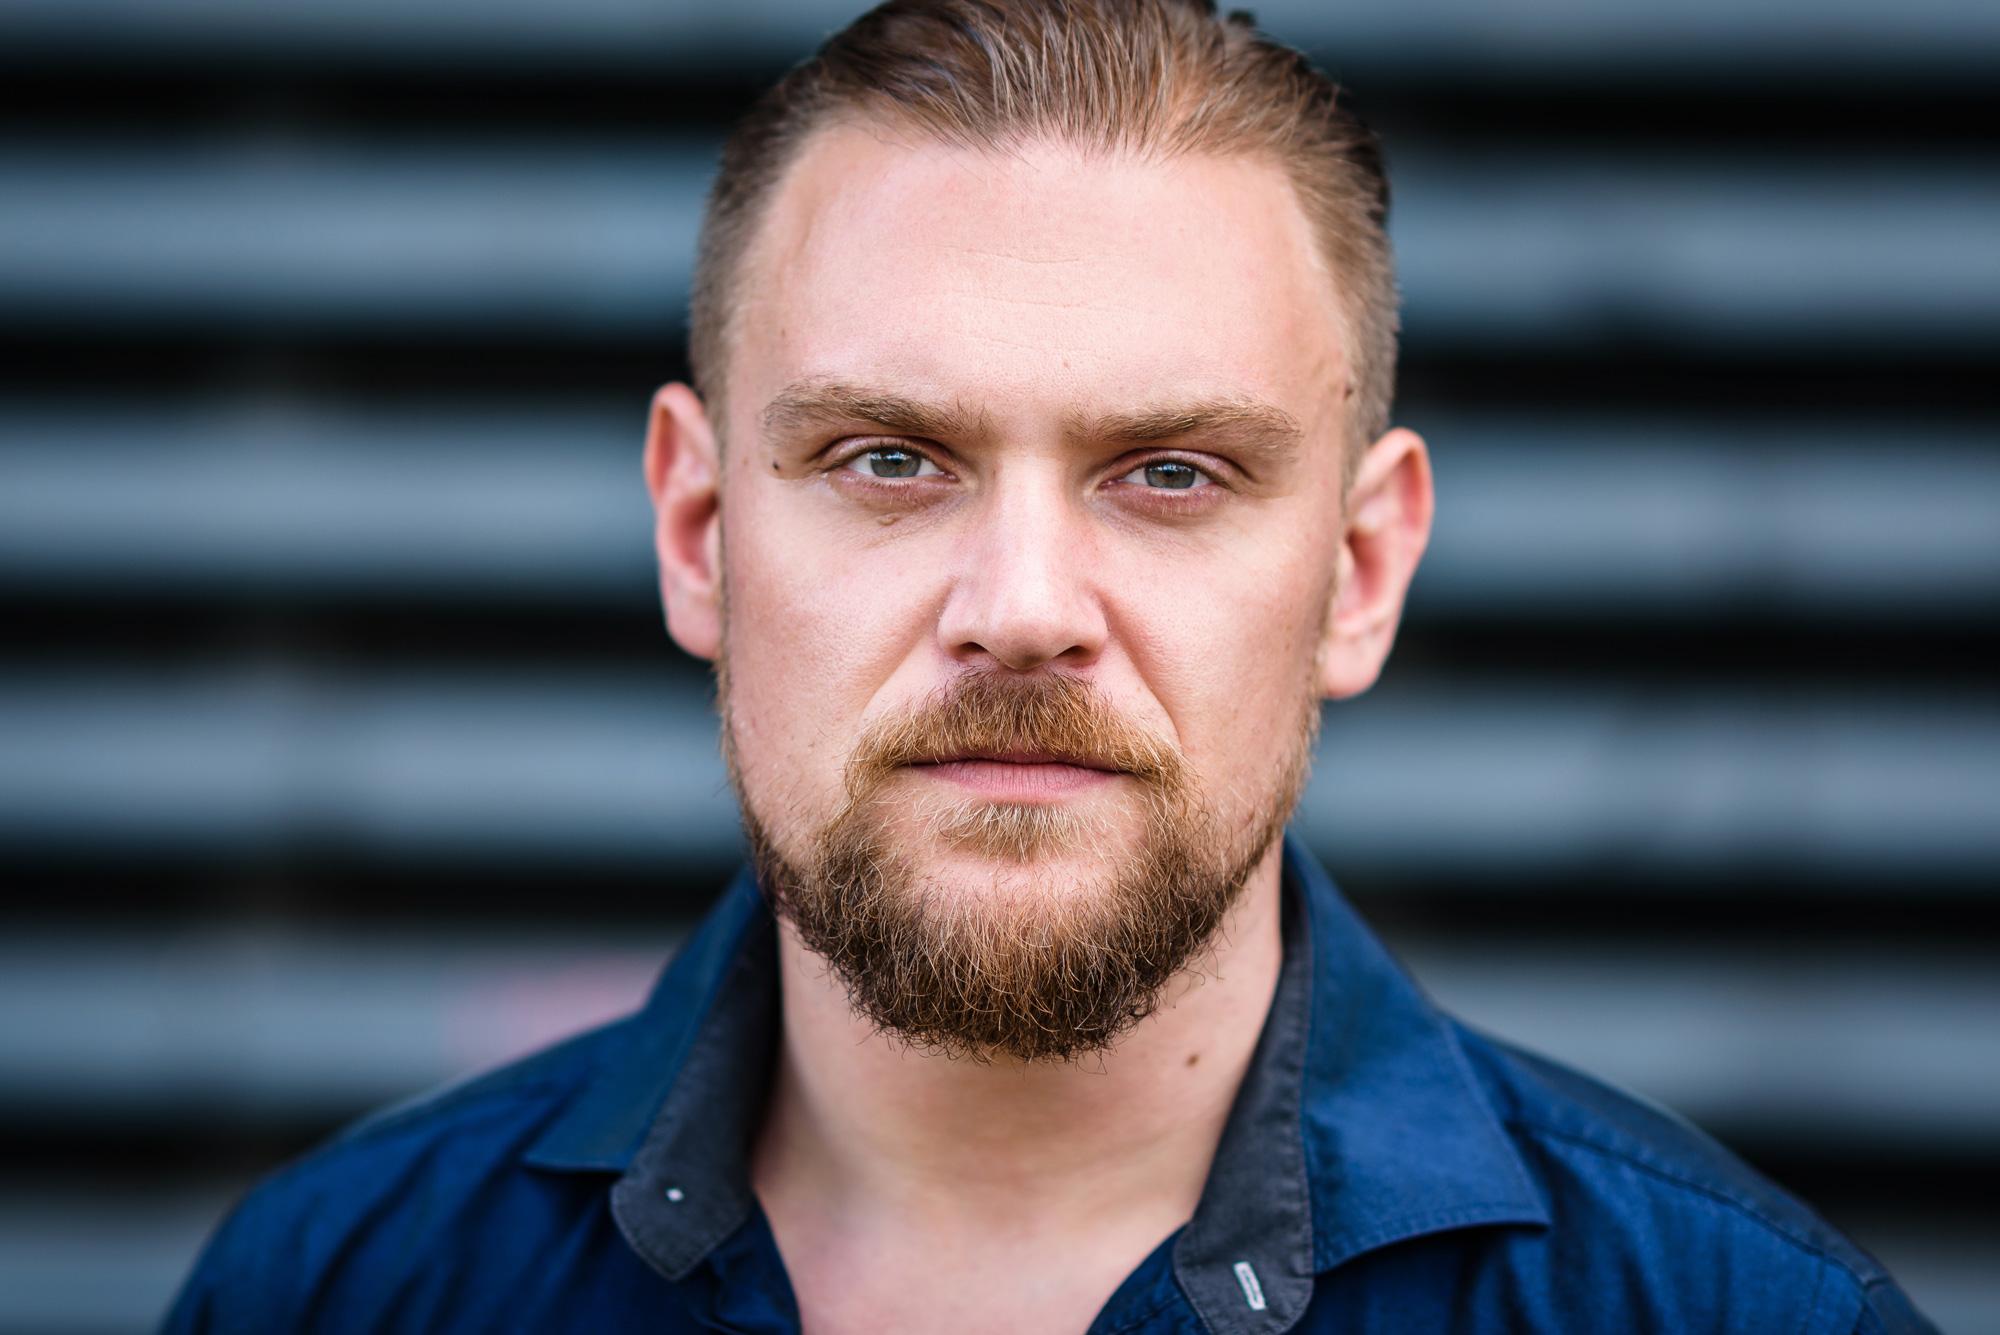 Florian Schmidtke